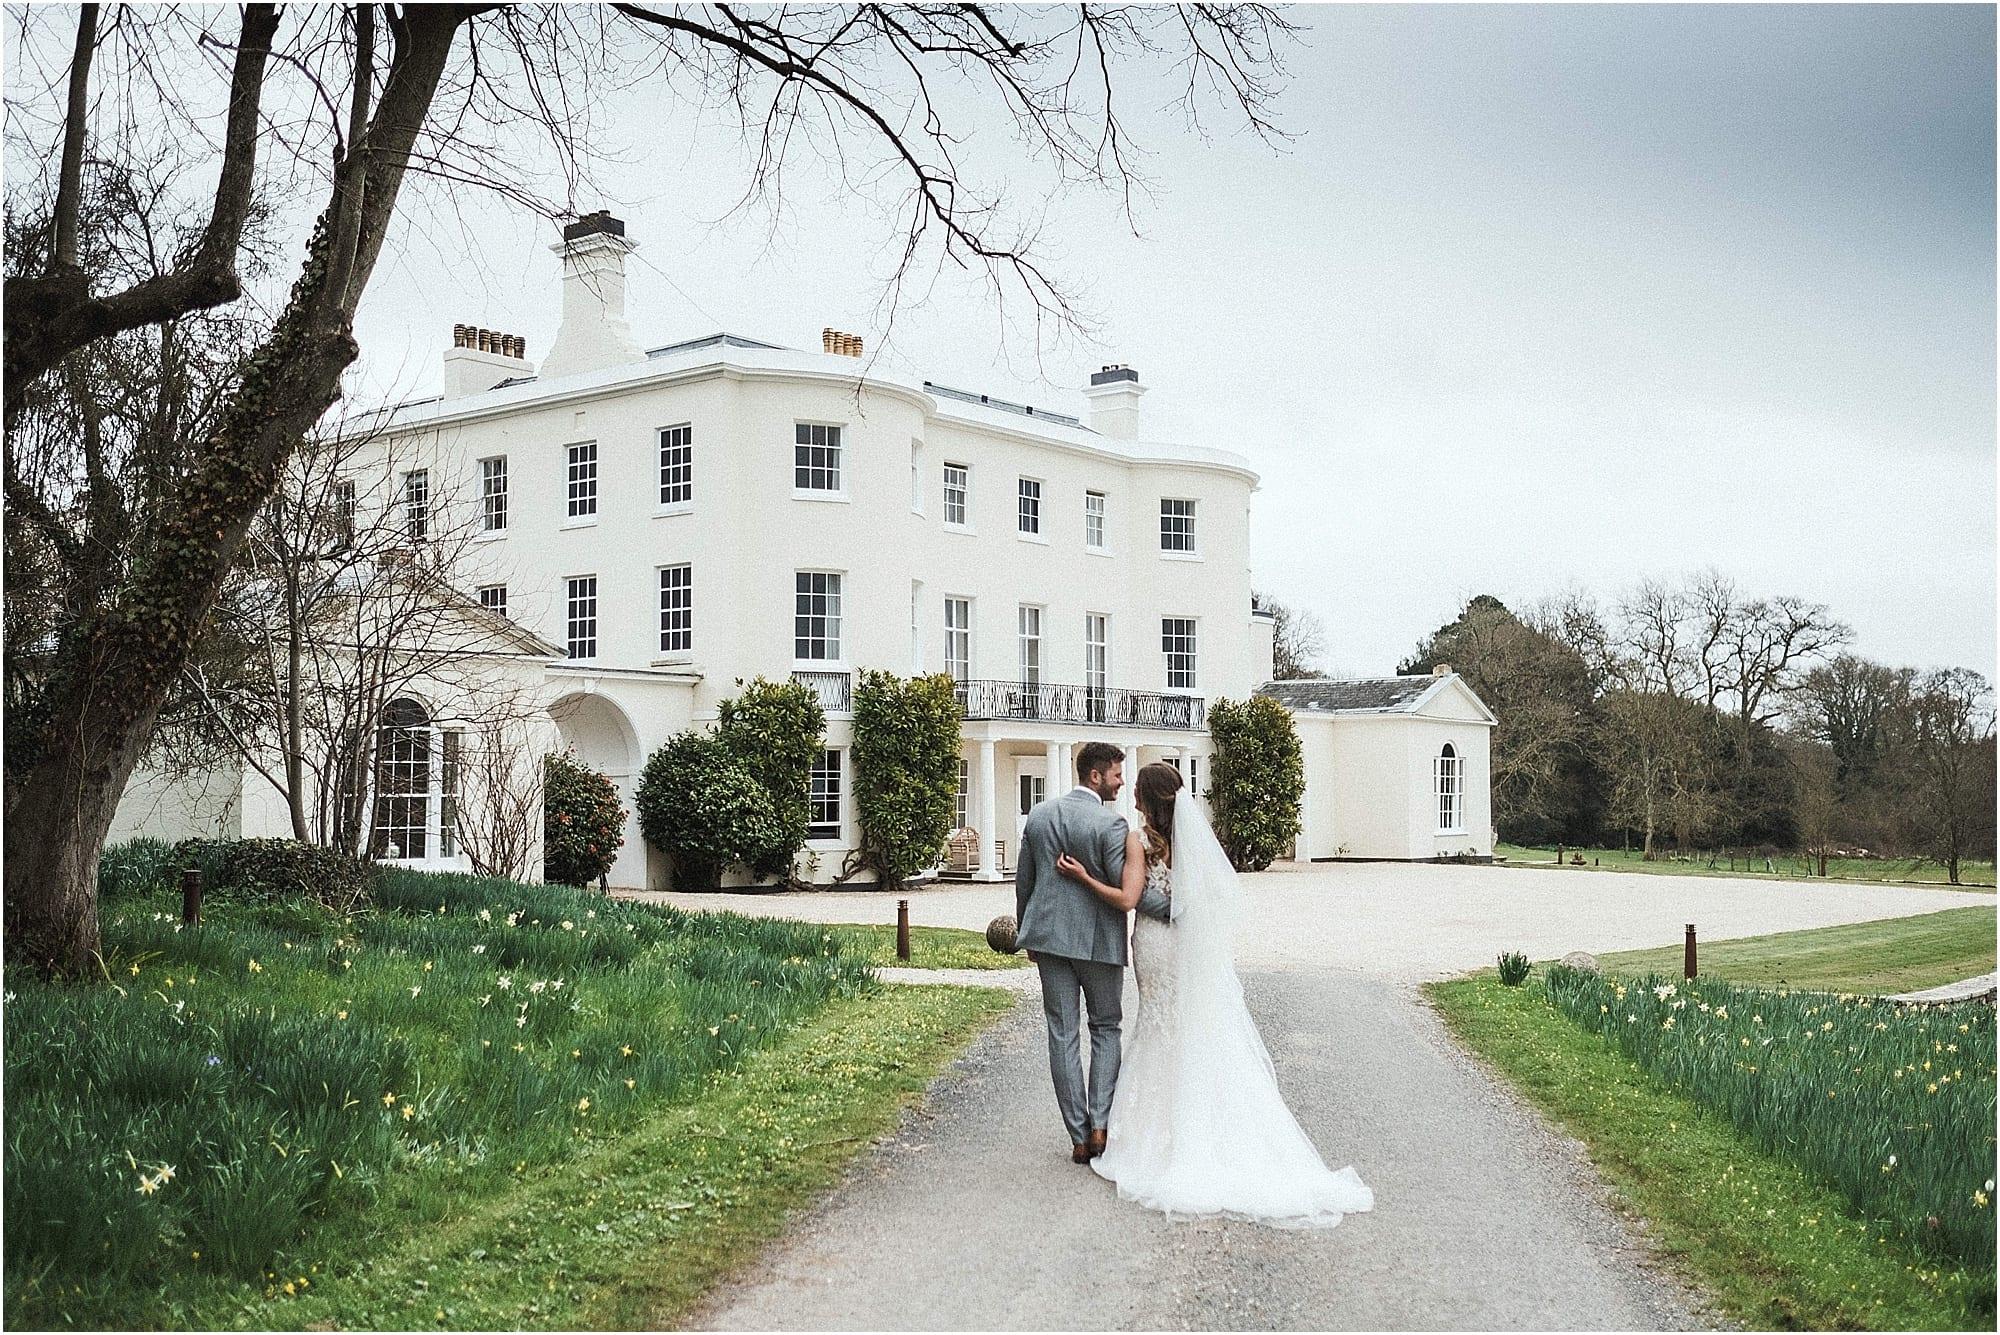 April wedding at Rockbeare Manor